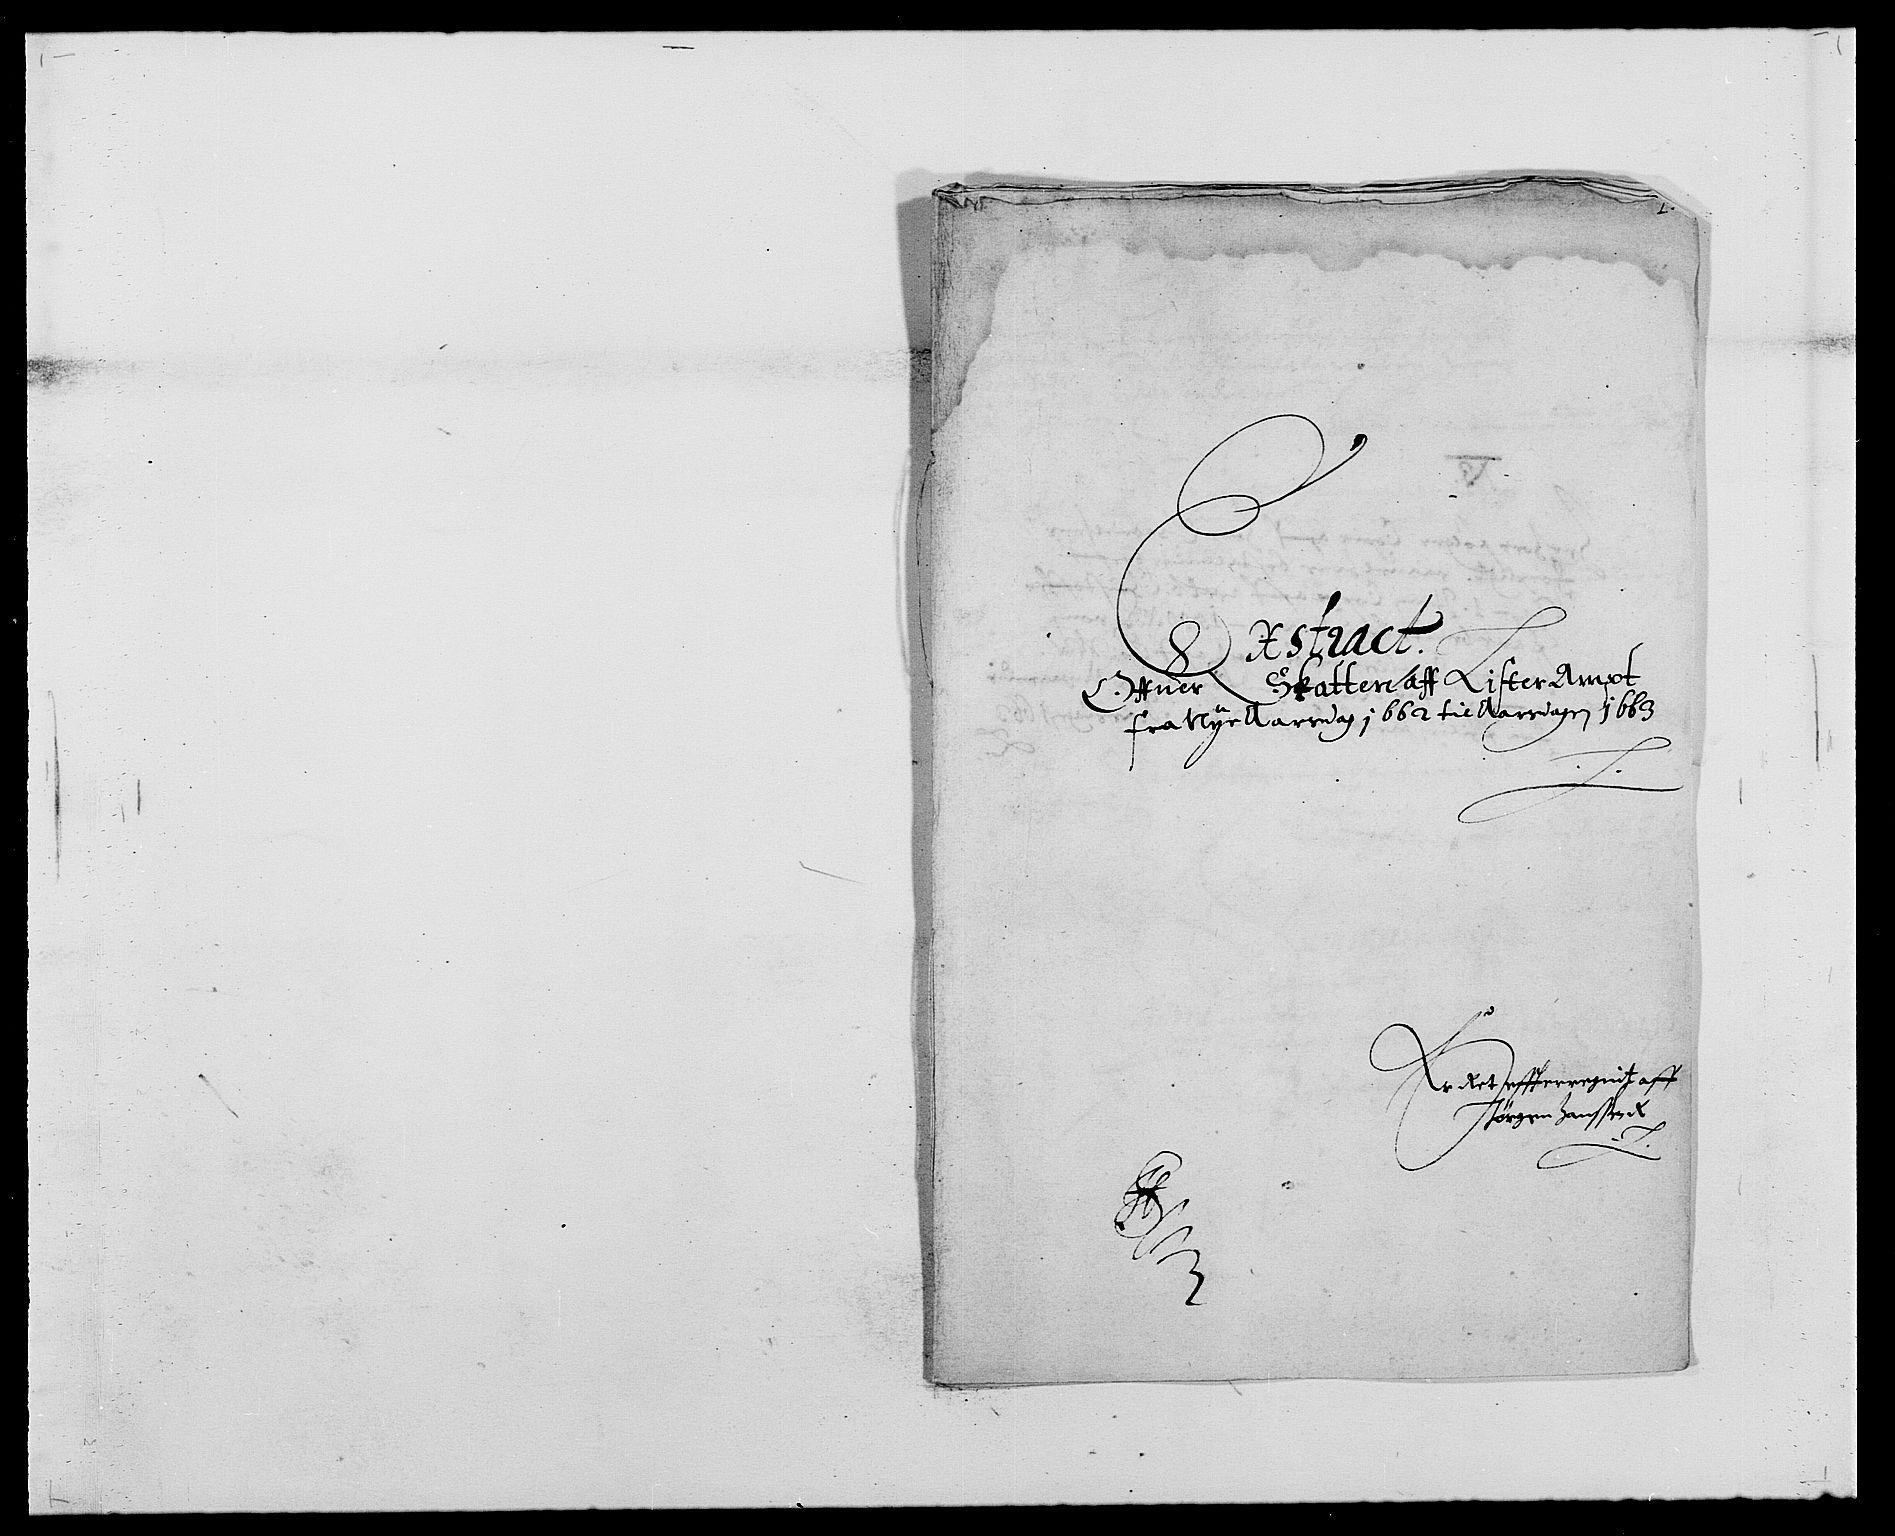 RA, Rentekammeret inntil 1814, Reviderte regnskaper, Fogderegnskap, R41/L2522: Fogderegnskap Lista, 1662, s. 64